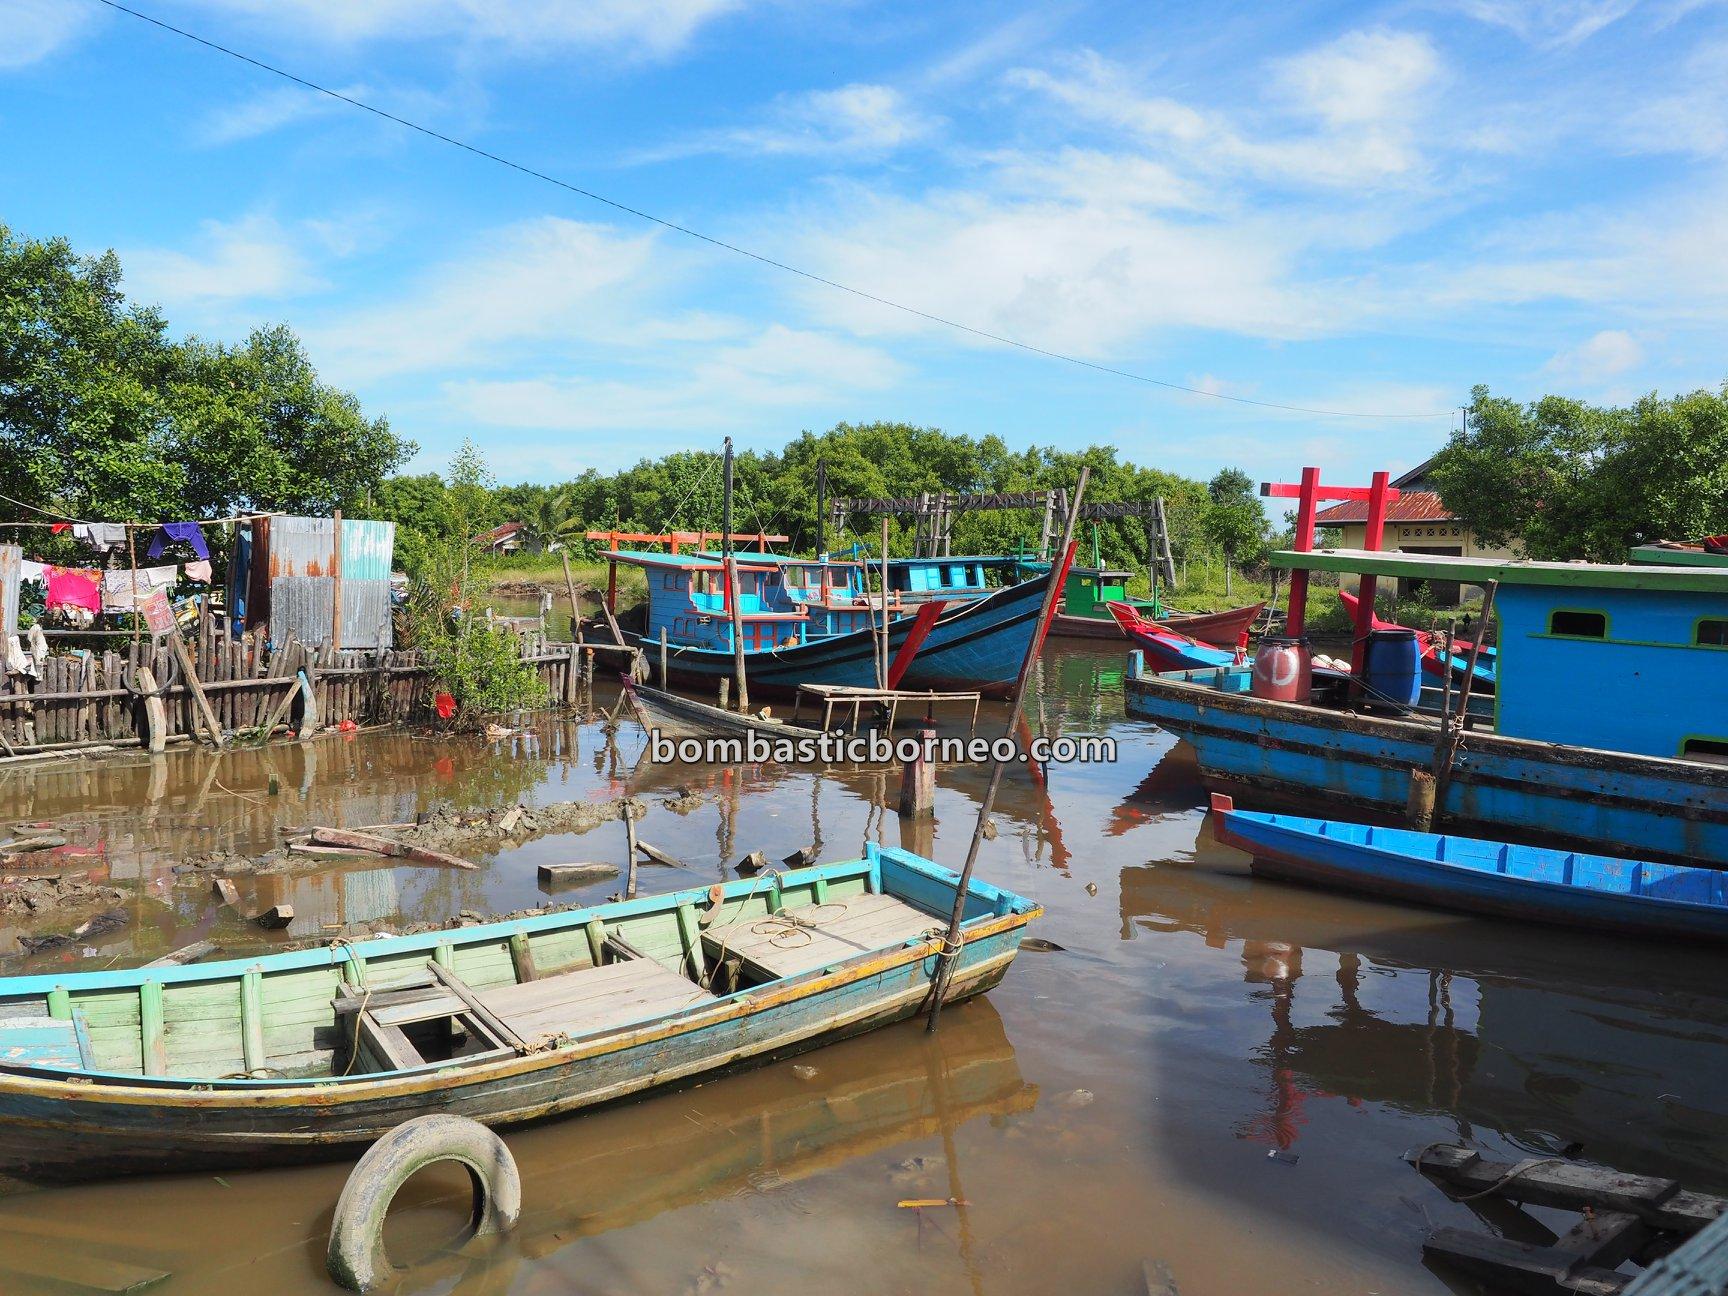 Kampung Nelayan Melayu, Malay Fishing Village, authentic, traditional, backpackers, destination, Indonesia, Kalimantan Barat, Kota Singkawang, Kelurahan Kuala, Tourism, tourist attraction, travel guide, Borneo, cross border